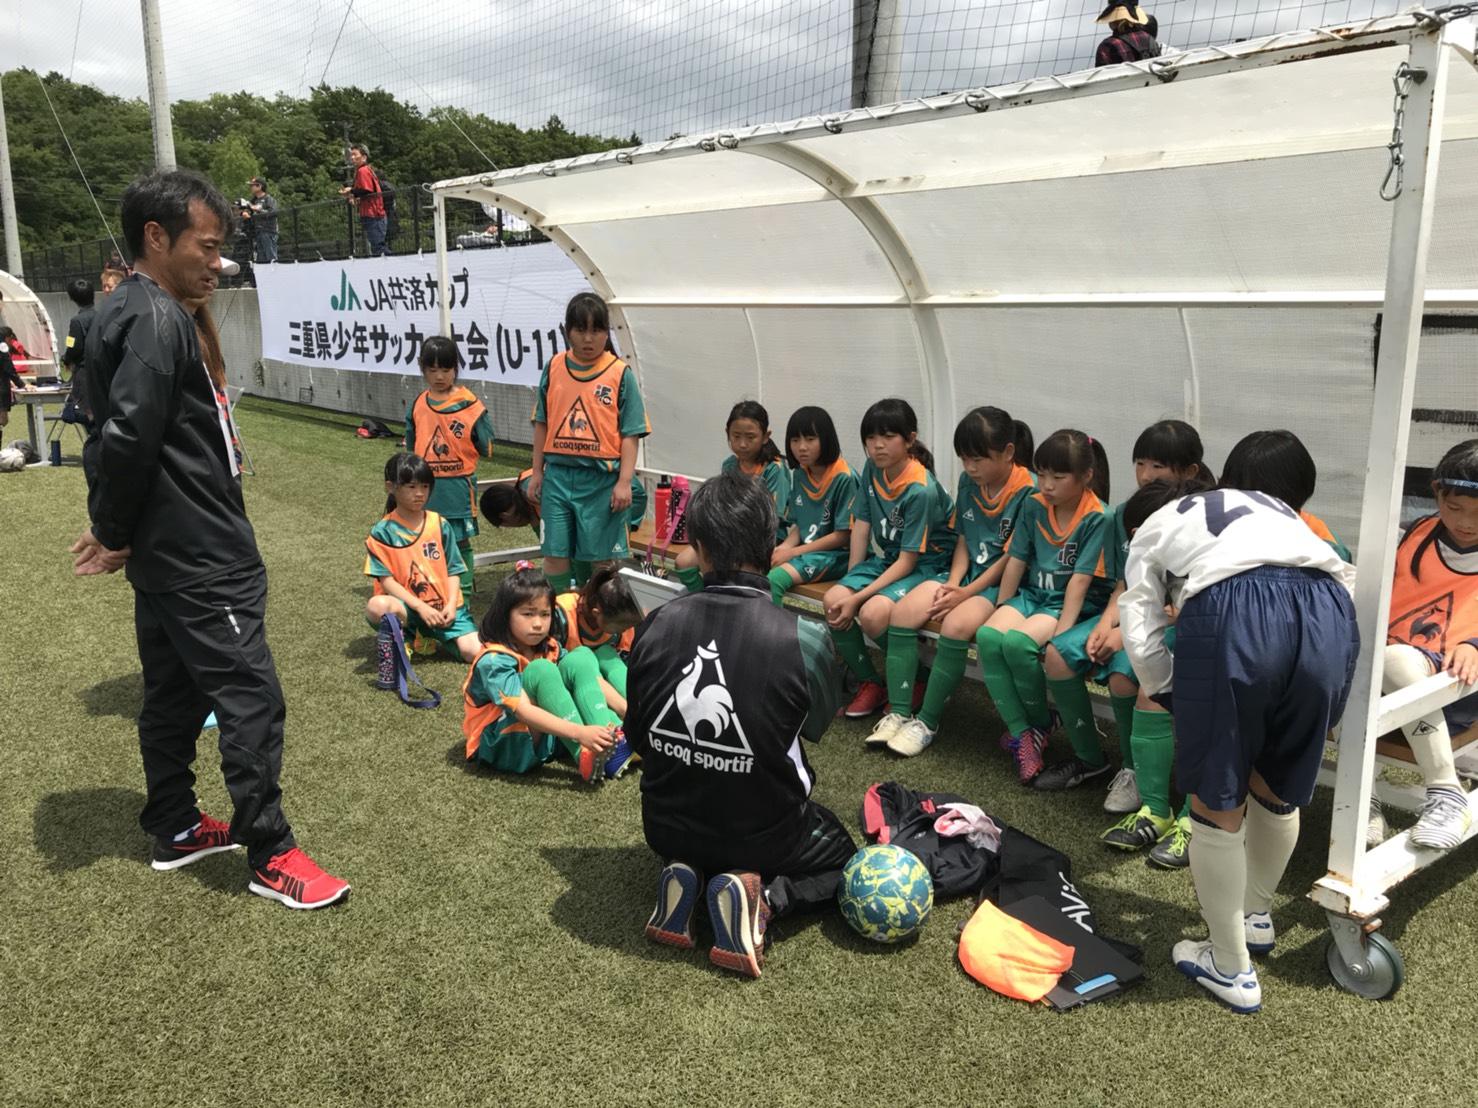 JA共催カップ  試合結果 – 伊賀フットボールクラブ くノ一